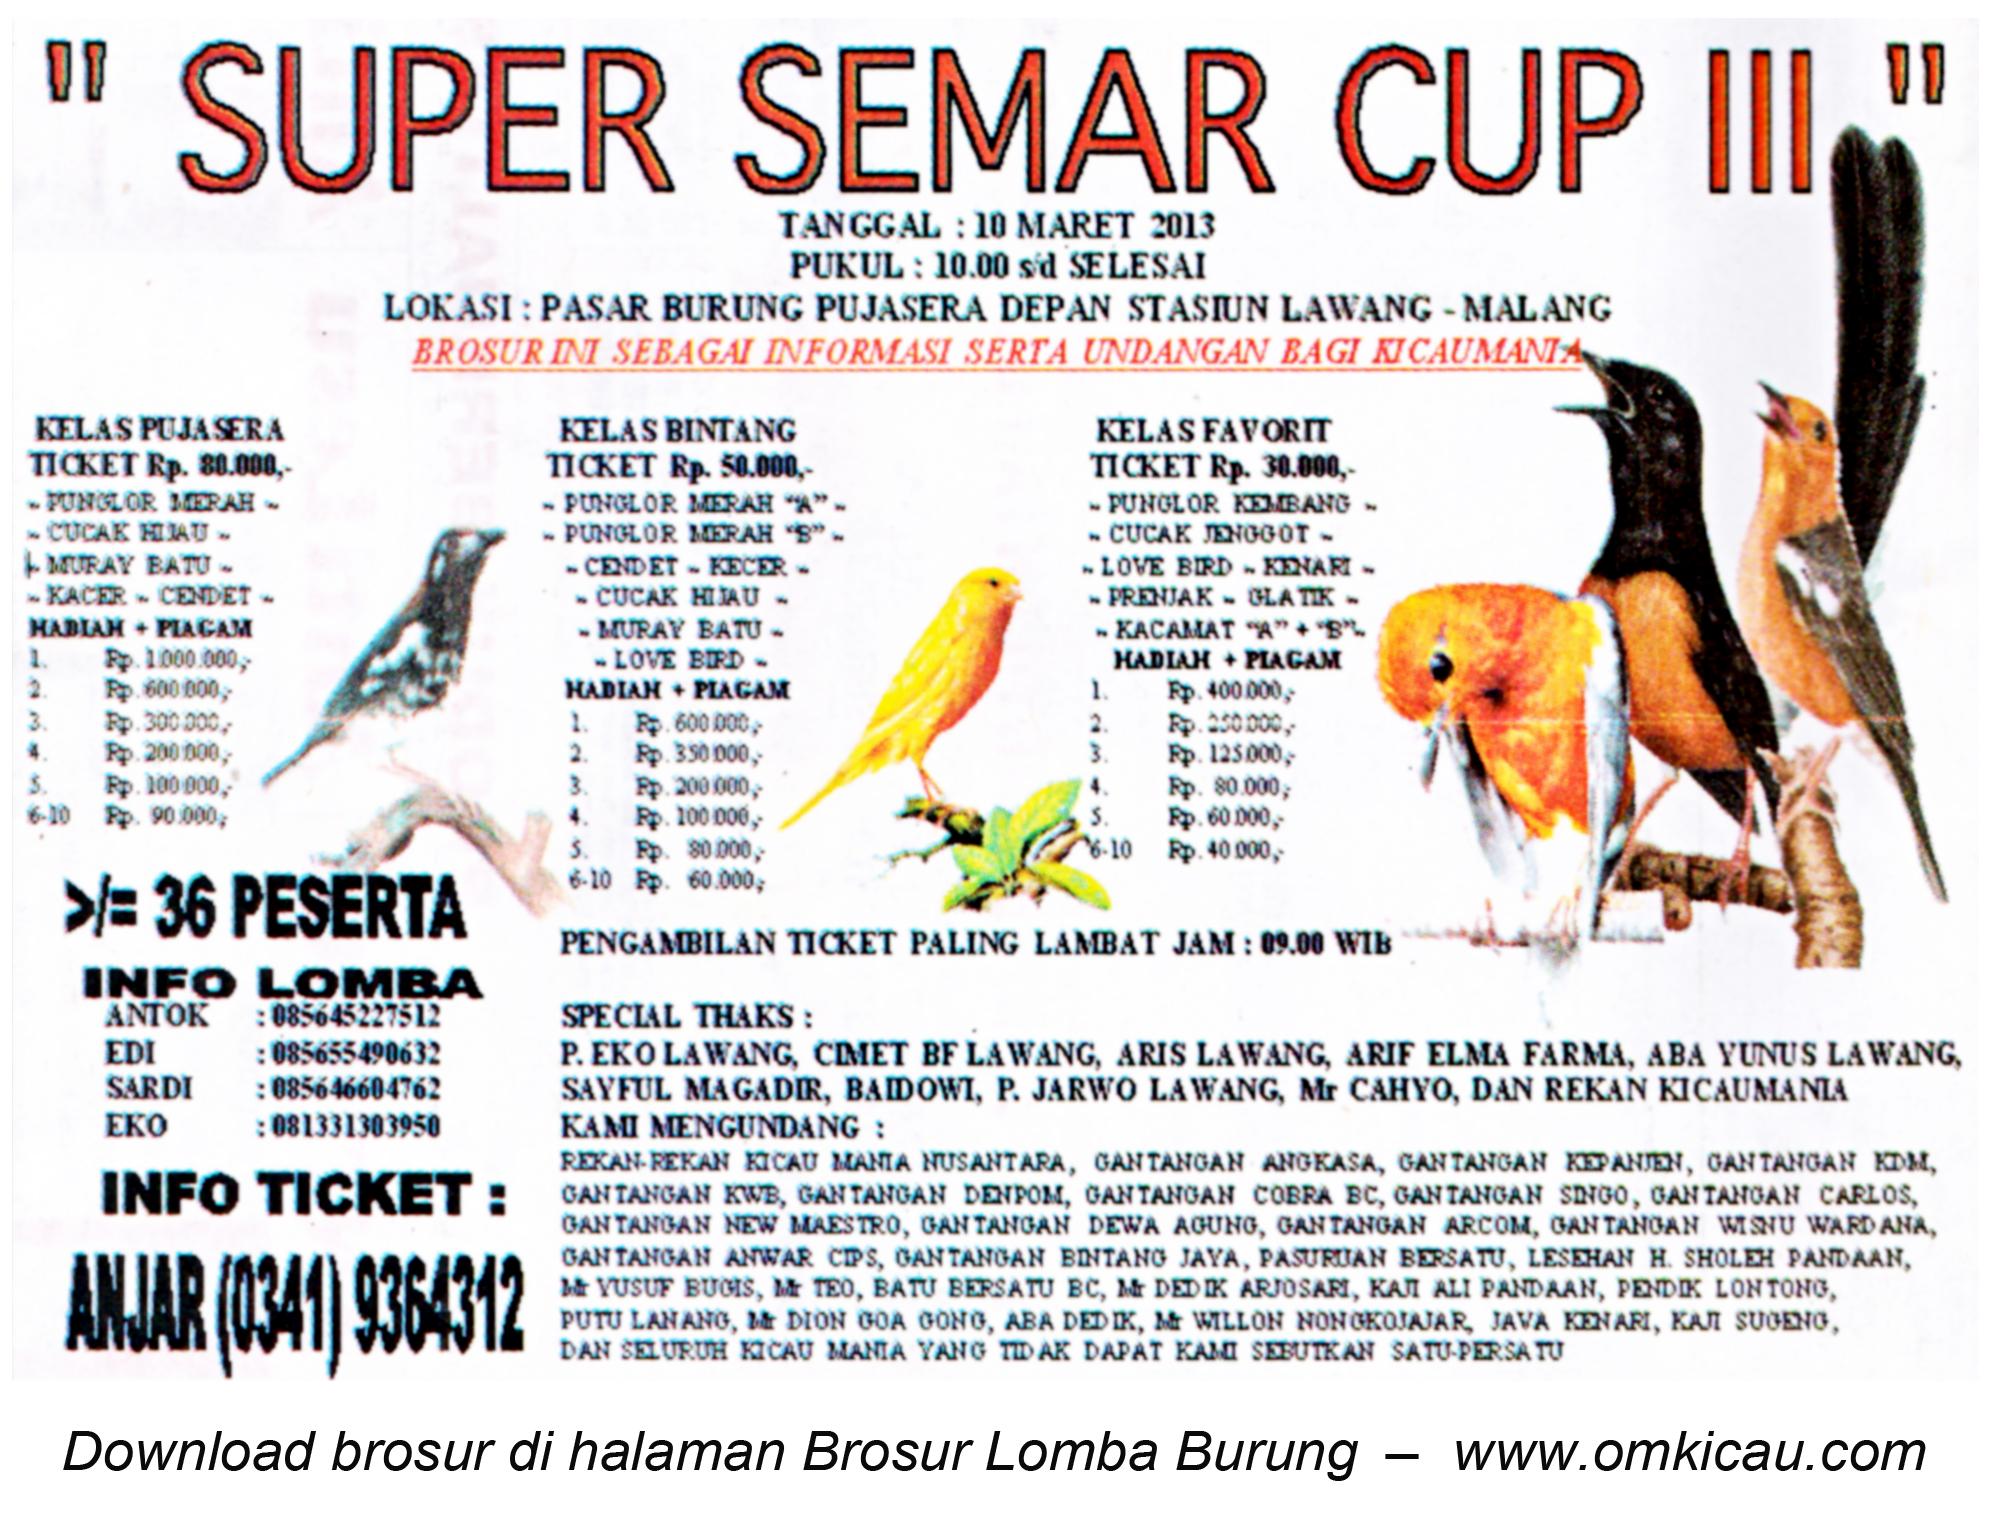 brosur-lomba-supersemar-cup